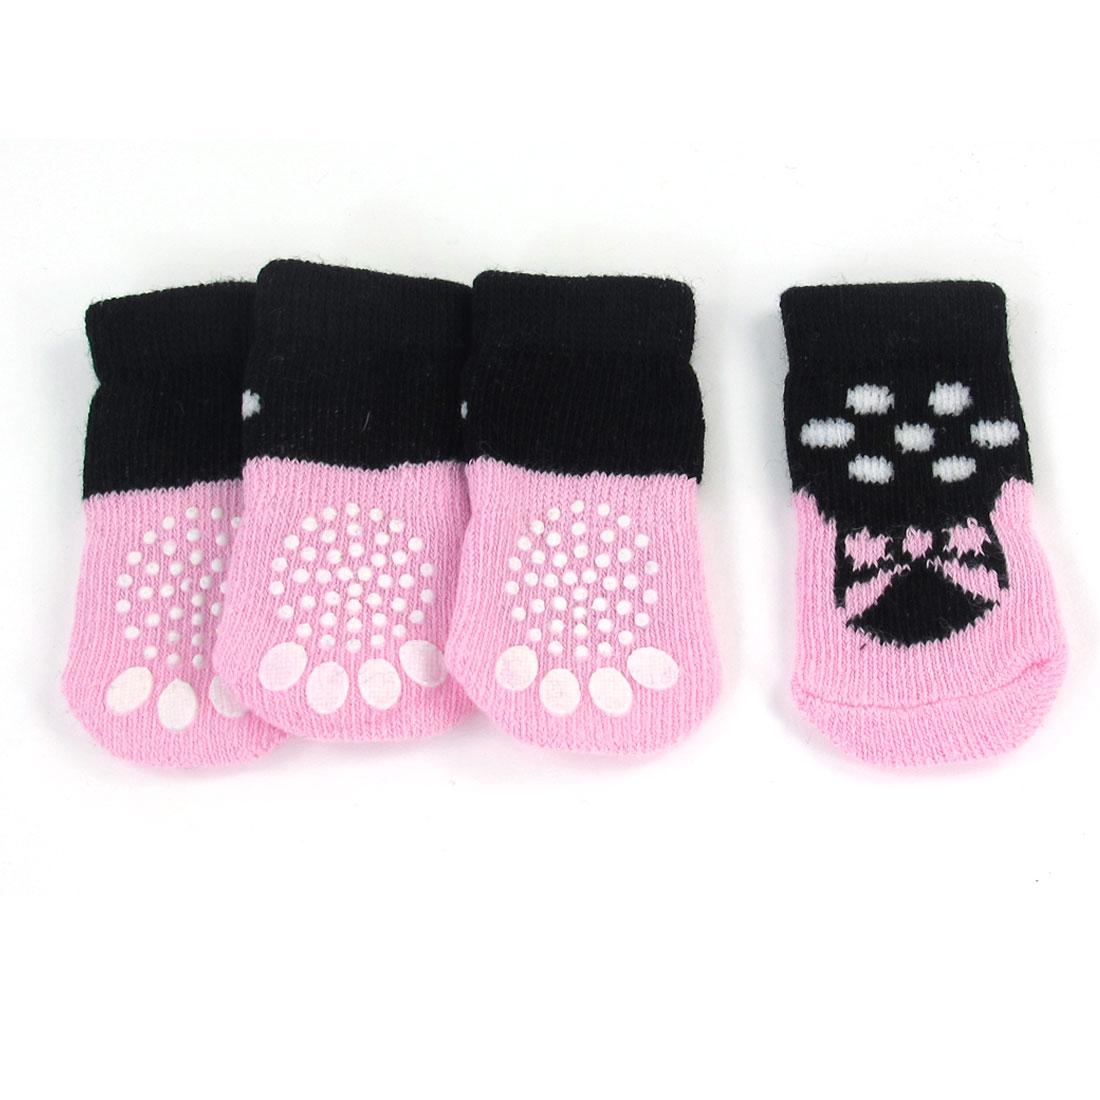 2 Pairs Pink Black Nonslip Stretchy Acrylic Pet Dog Puppy Socks Size S